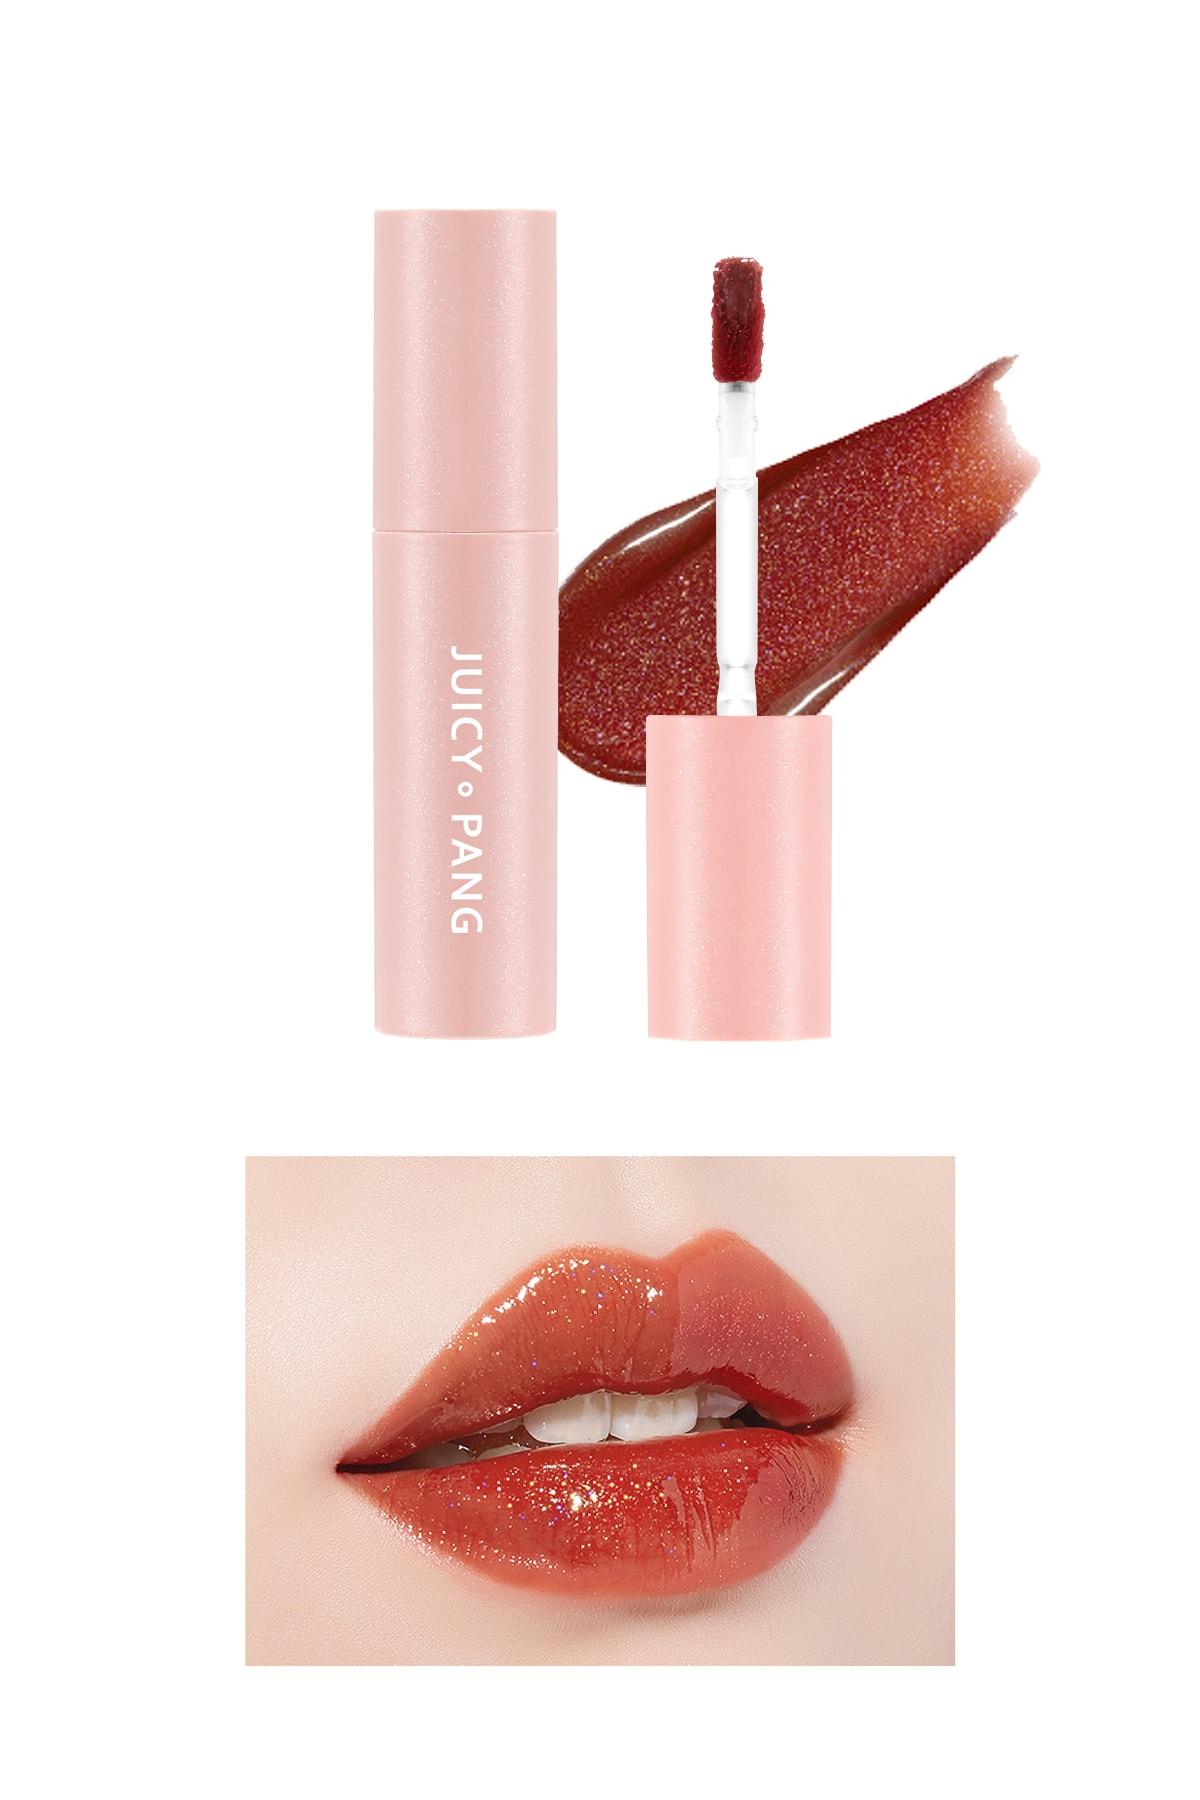 Missha Işıltı&Dolgunluk Veren  Parlak Gloss Tint APIEU Juicy-Pang Sparkling Tint CR01 0